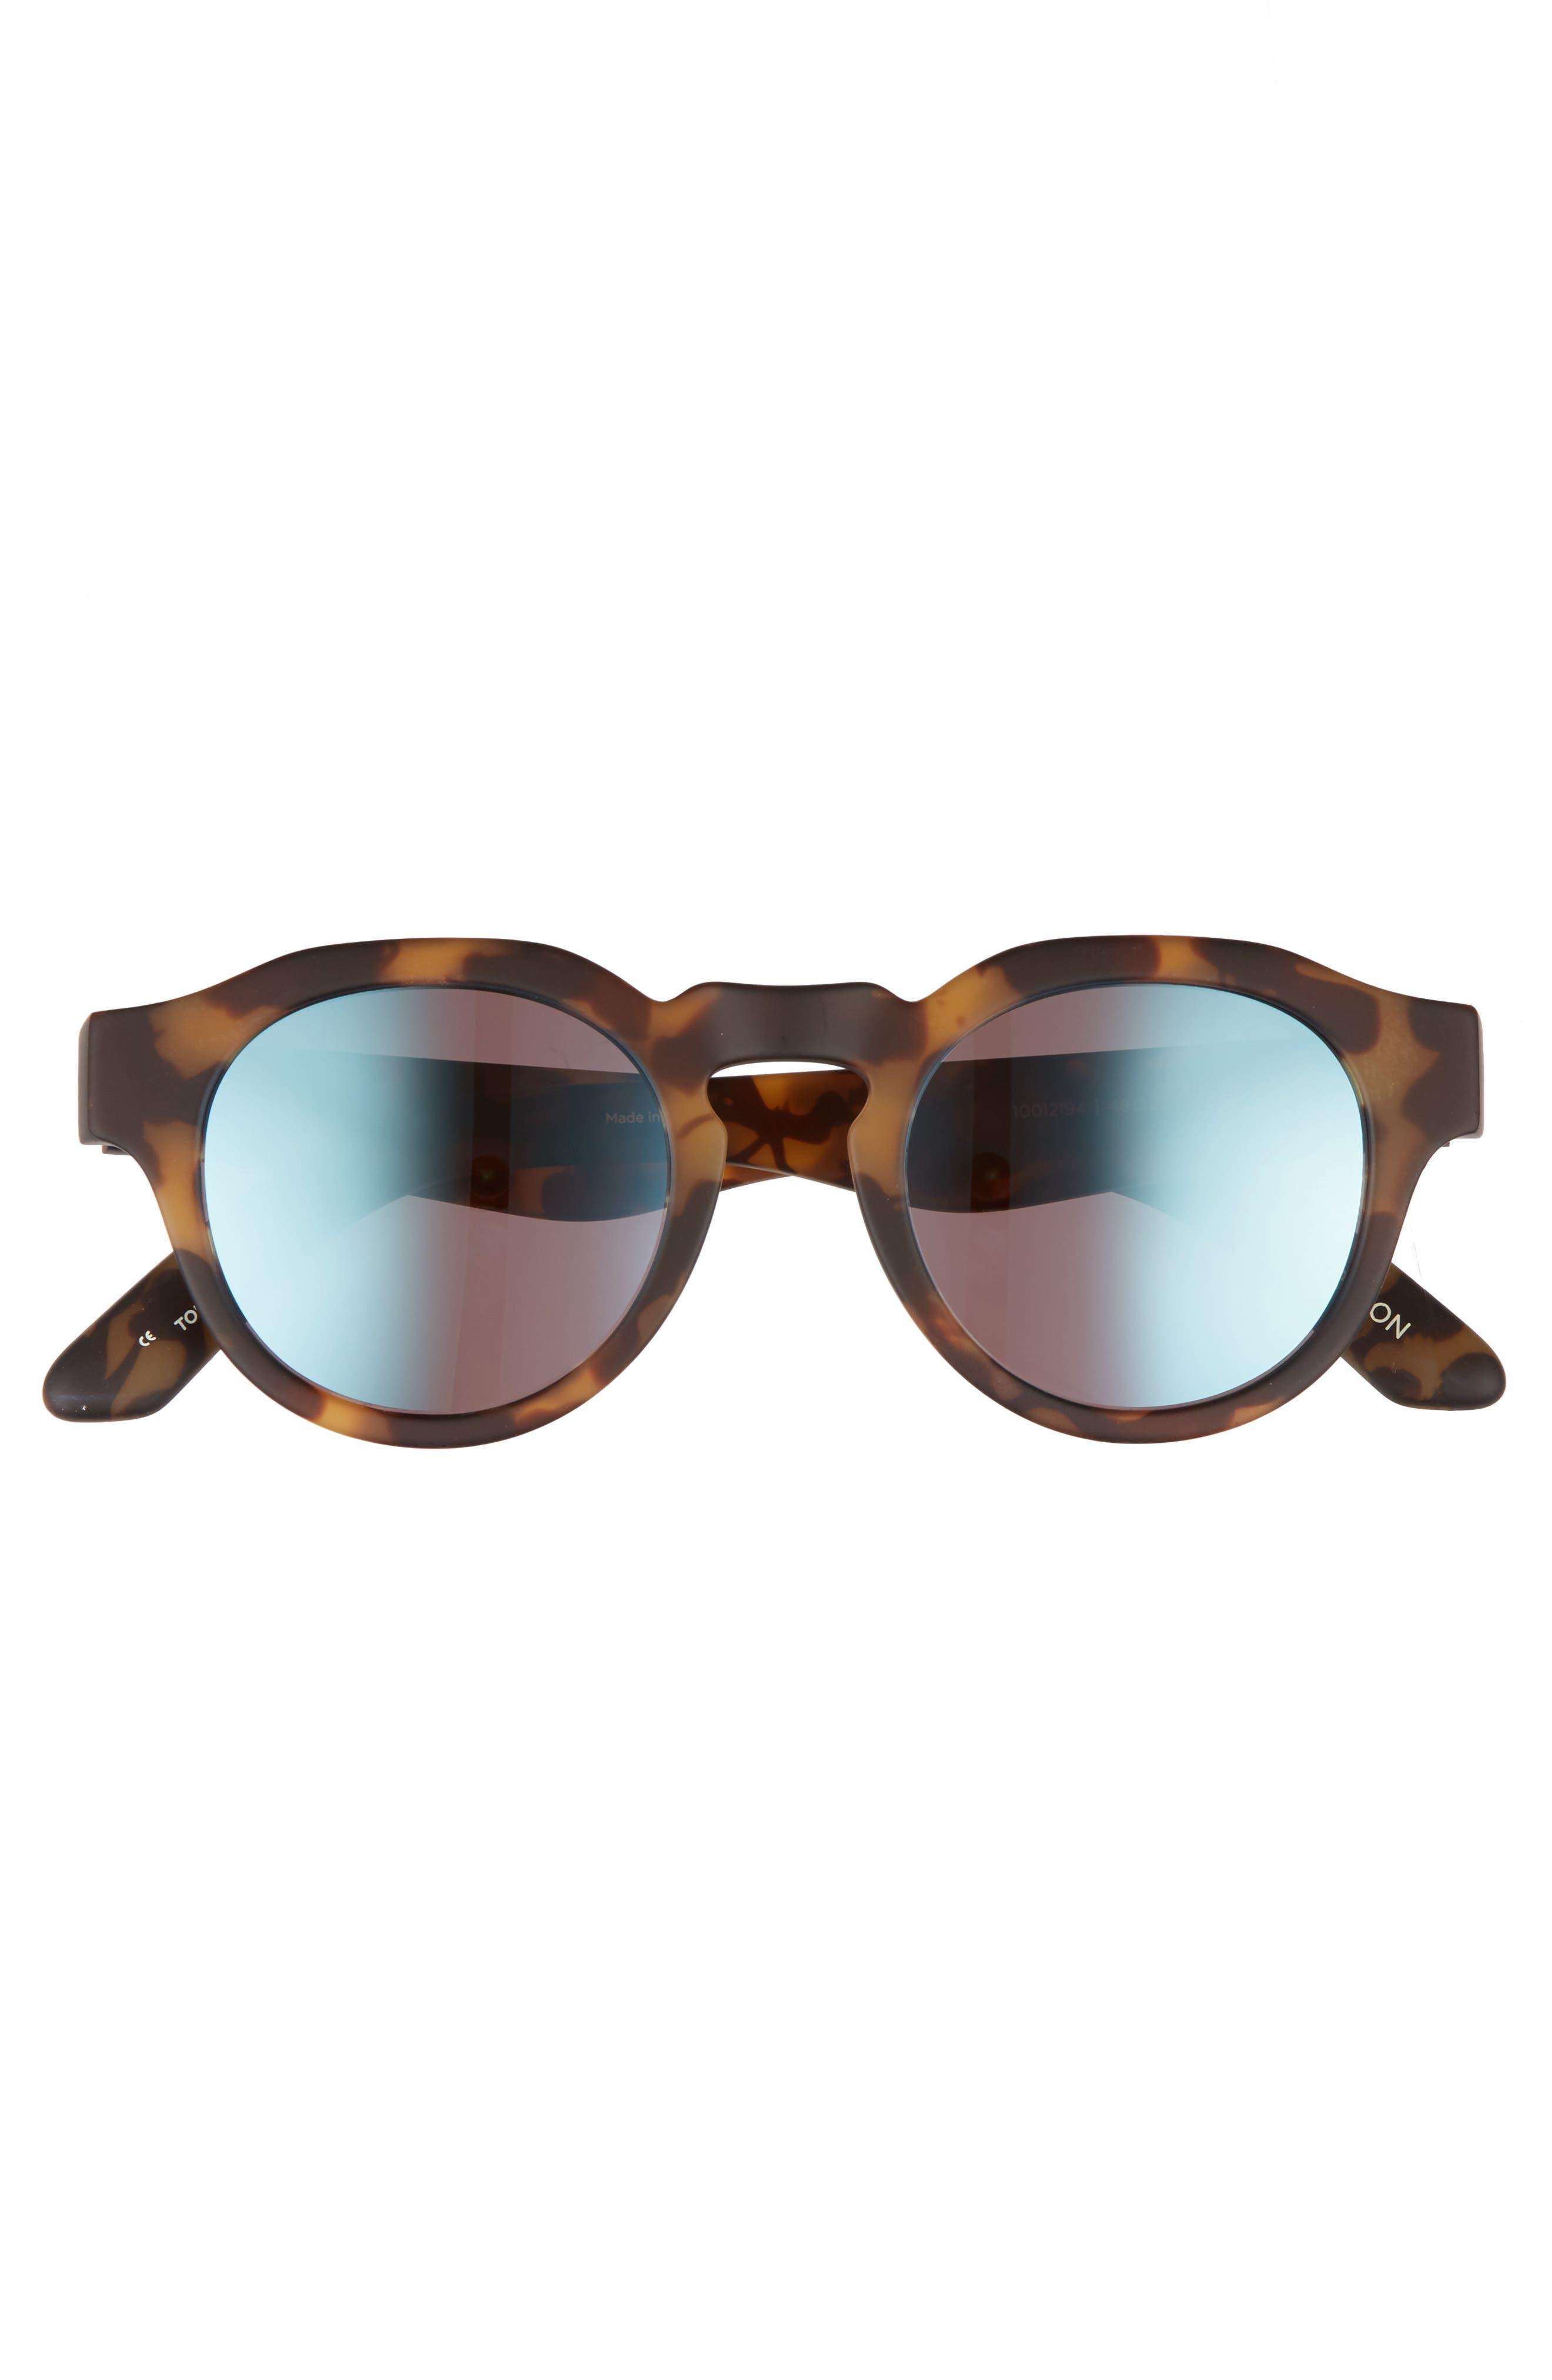 Bryton 48mm Sunglasses,                             Alternate thumbnail 2, color,                             BLONDE TORTOISE